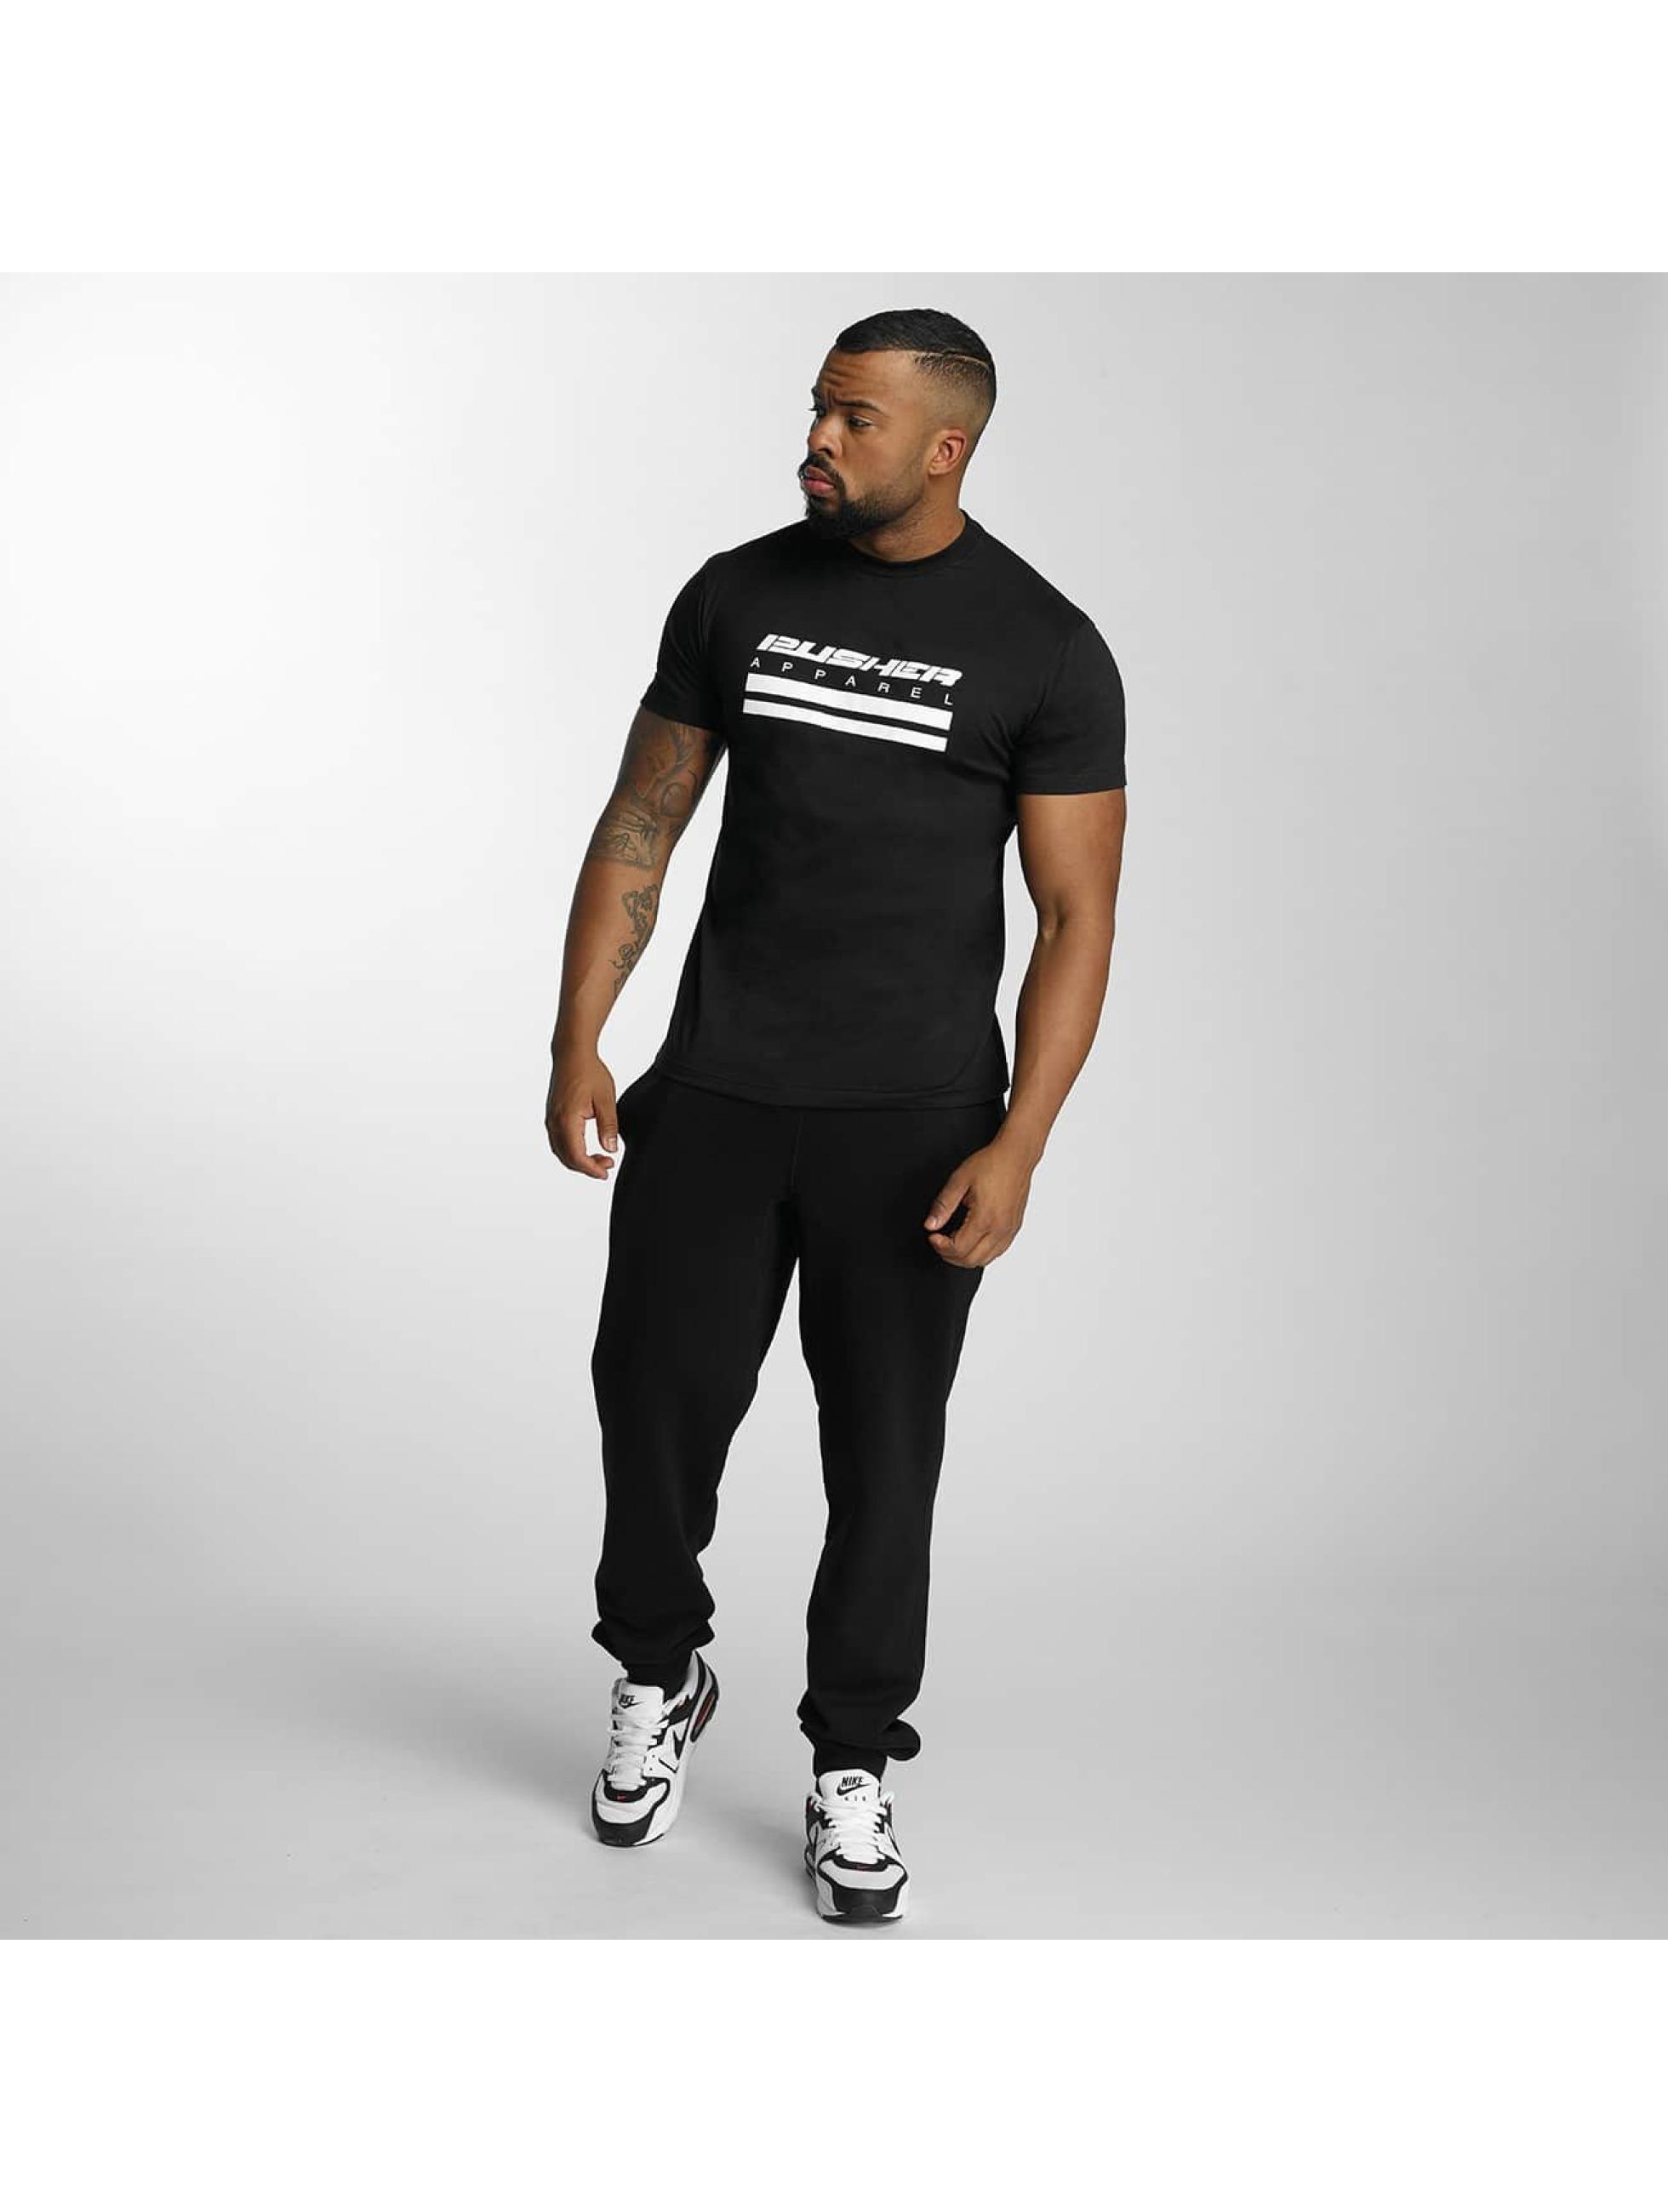 Pusher Apparel T-Shirt Apparel 503 Theft black